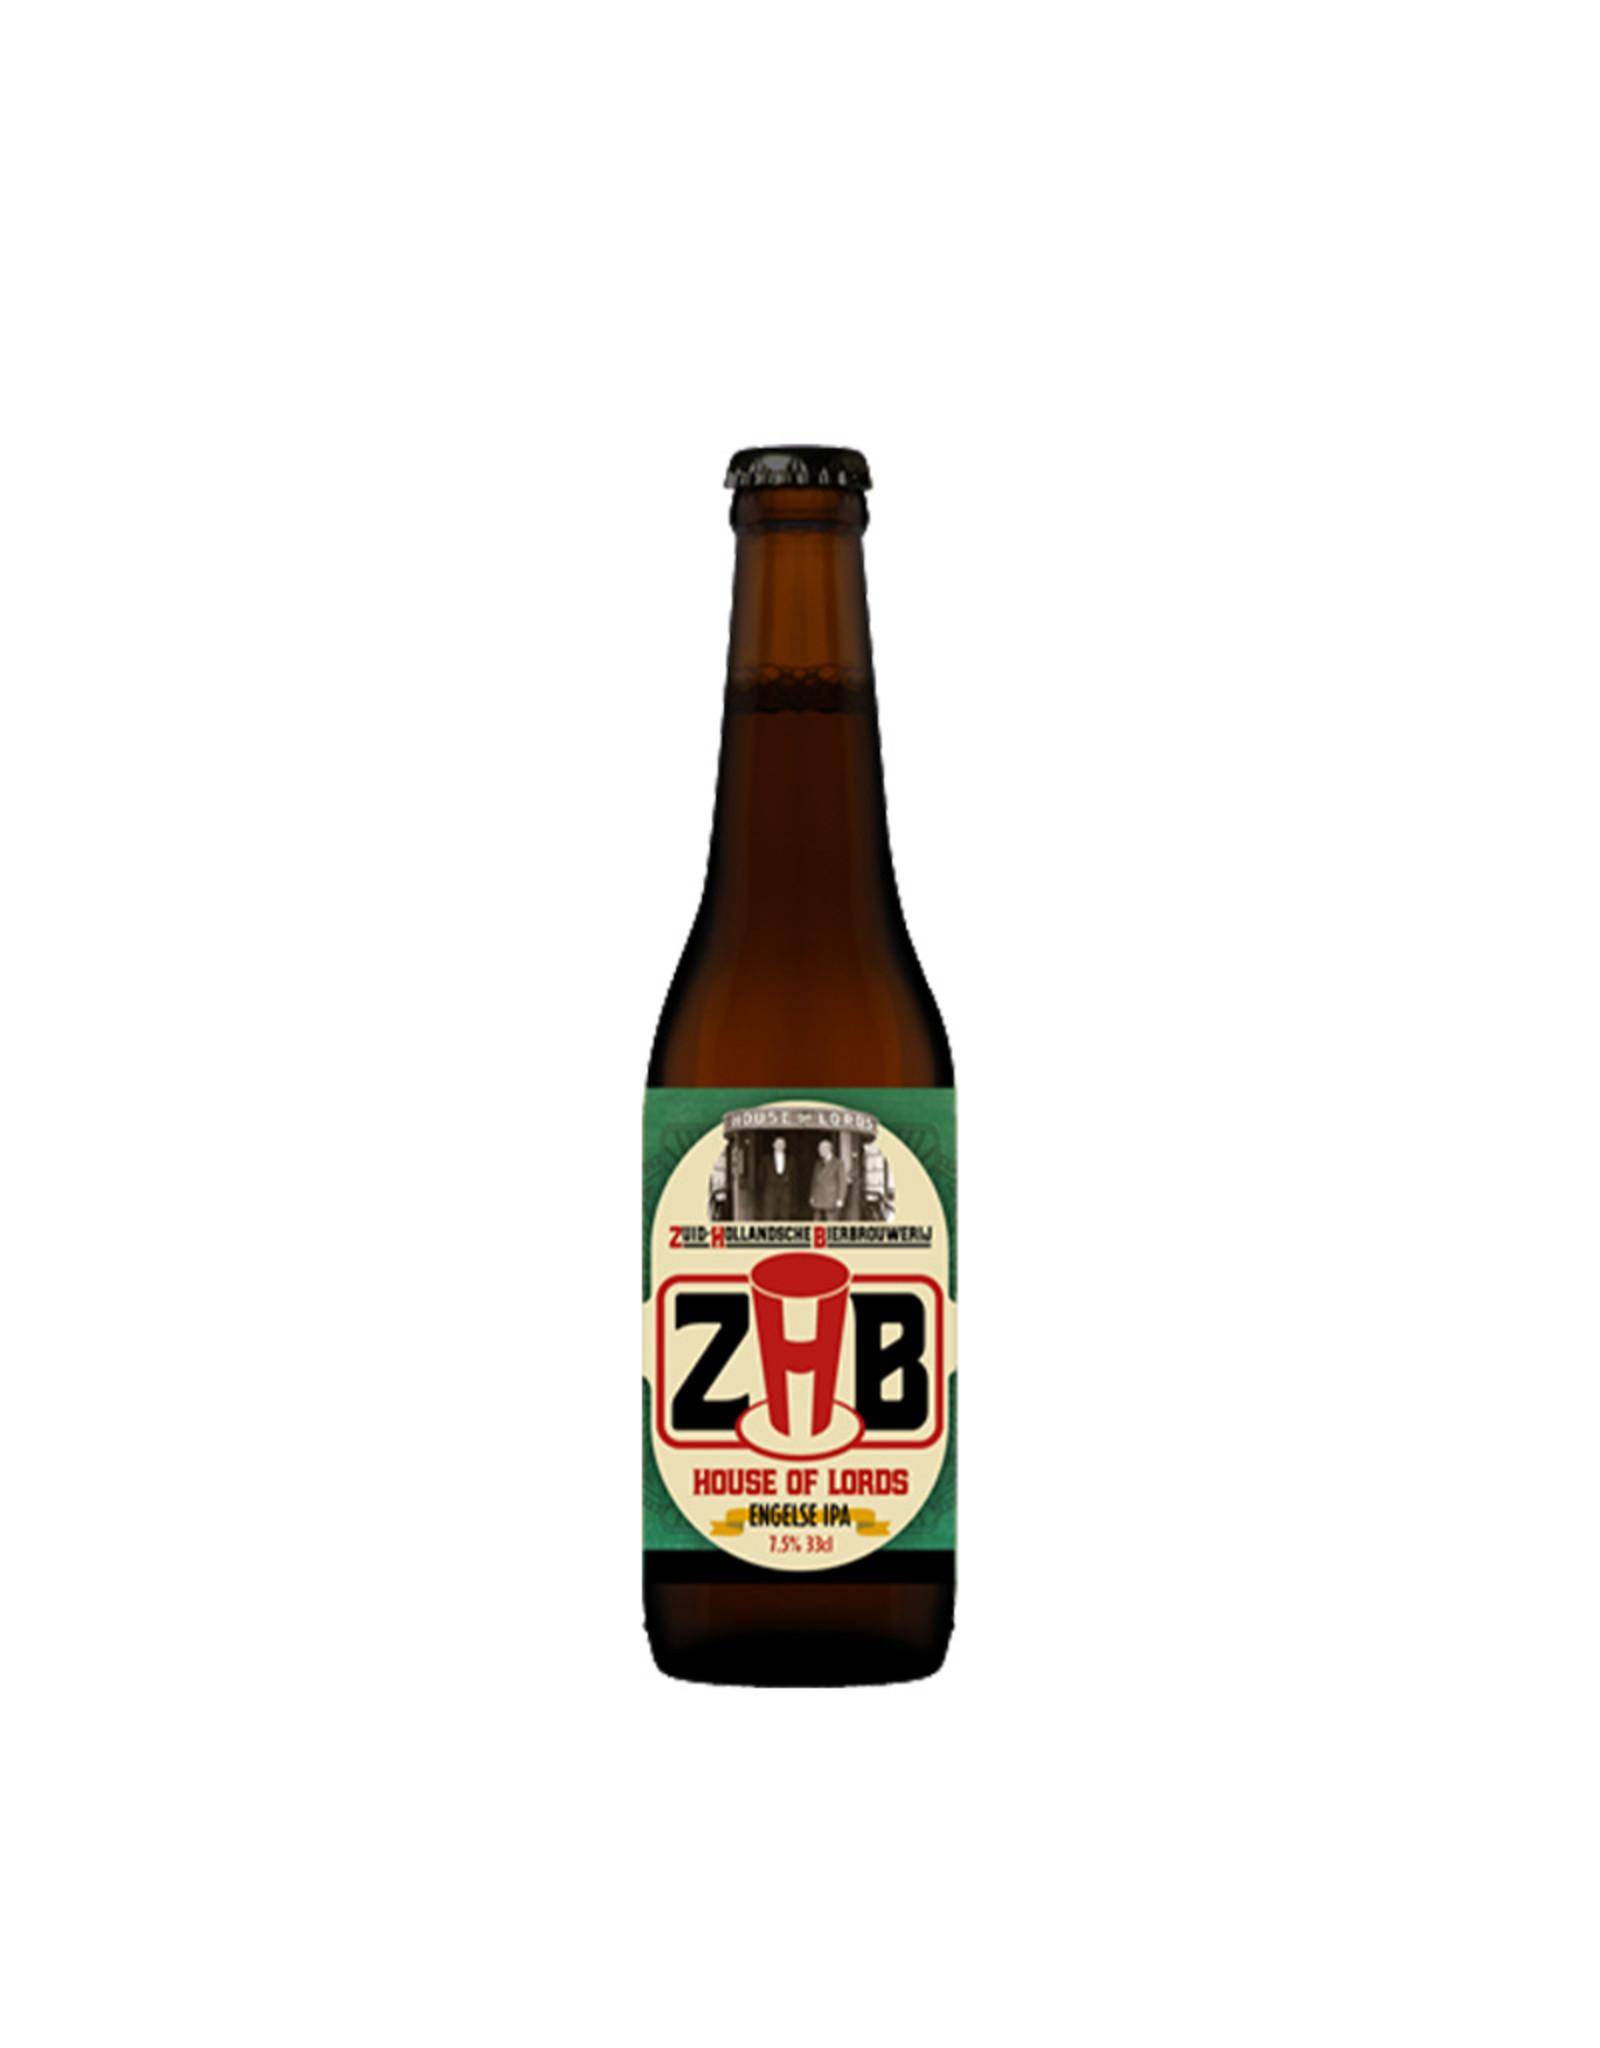 Zuid-Hollandsche Bierbrouwerij ZHB - House of Lords